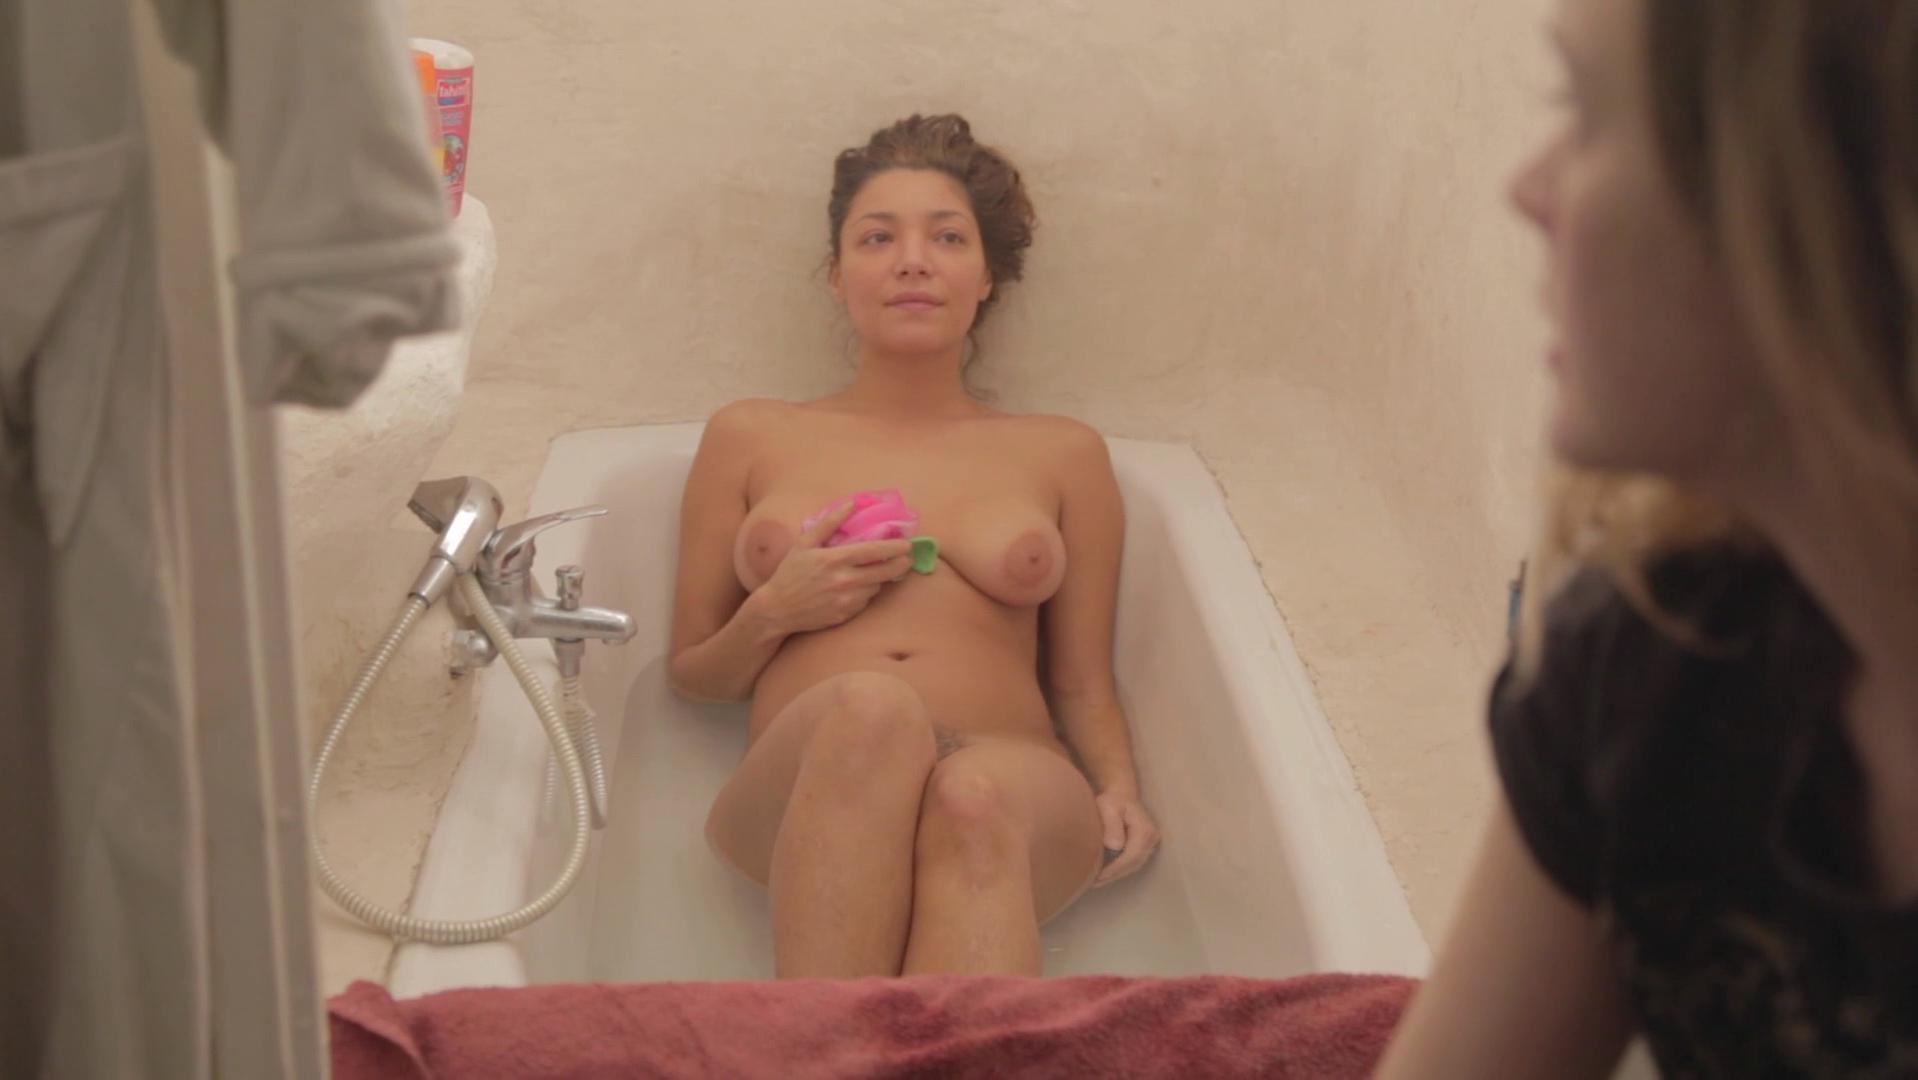 Ynda Rouya nude, Aurelie Houguenade nude - 4:48 (2014)